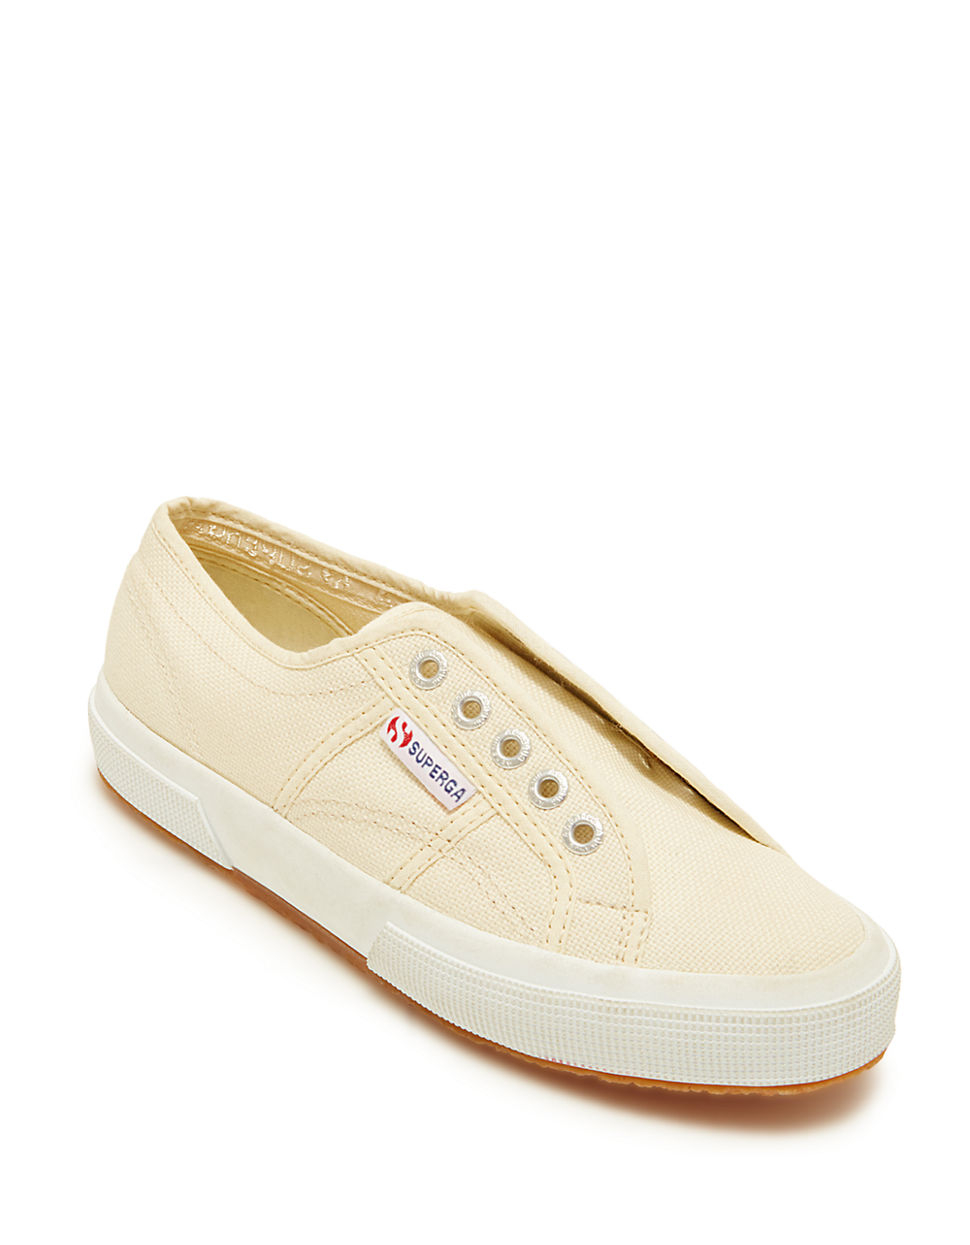 Revolve Tennis Shoes